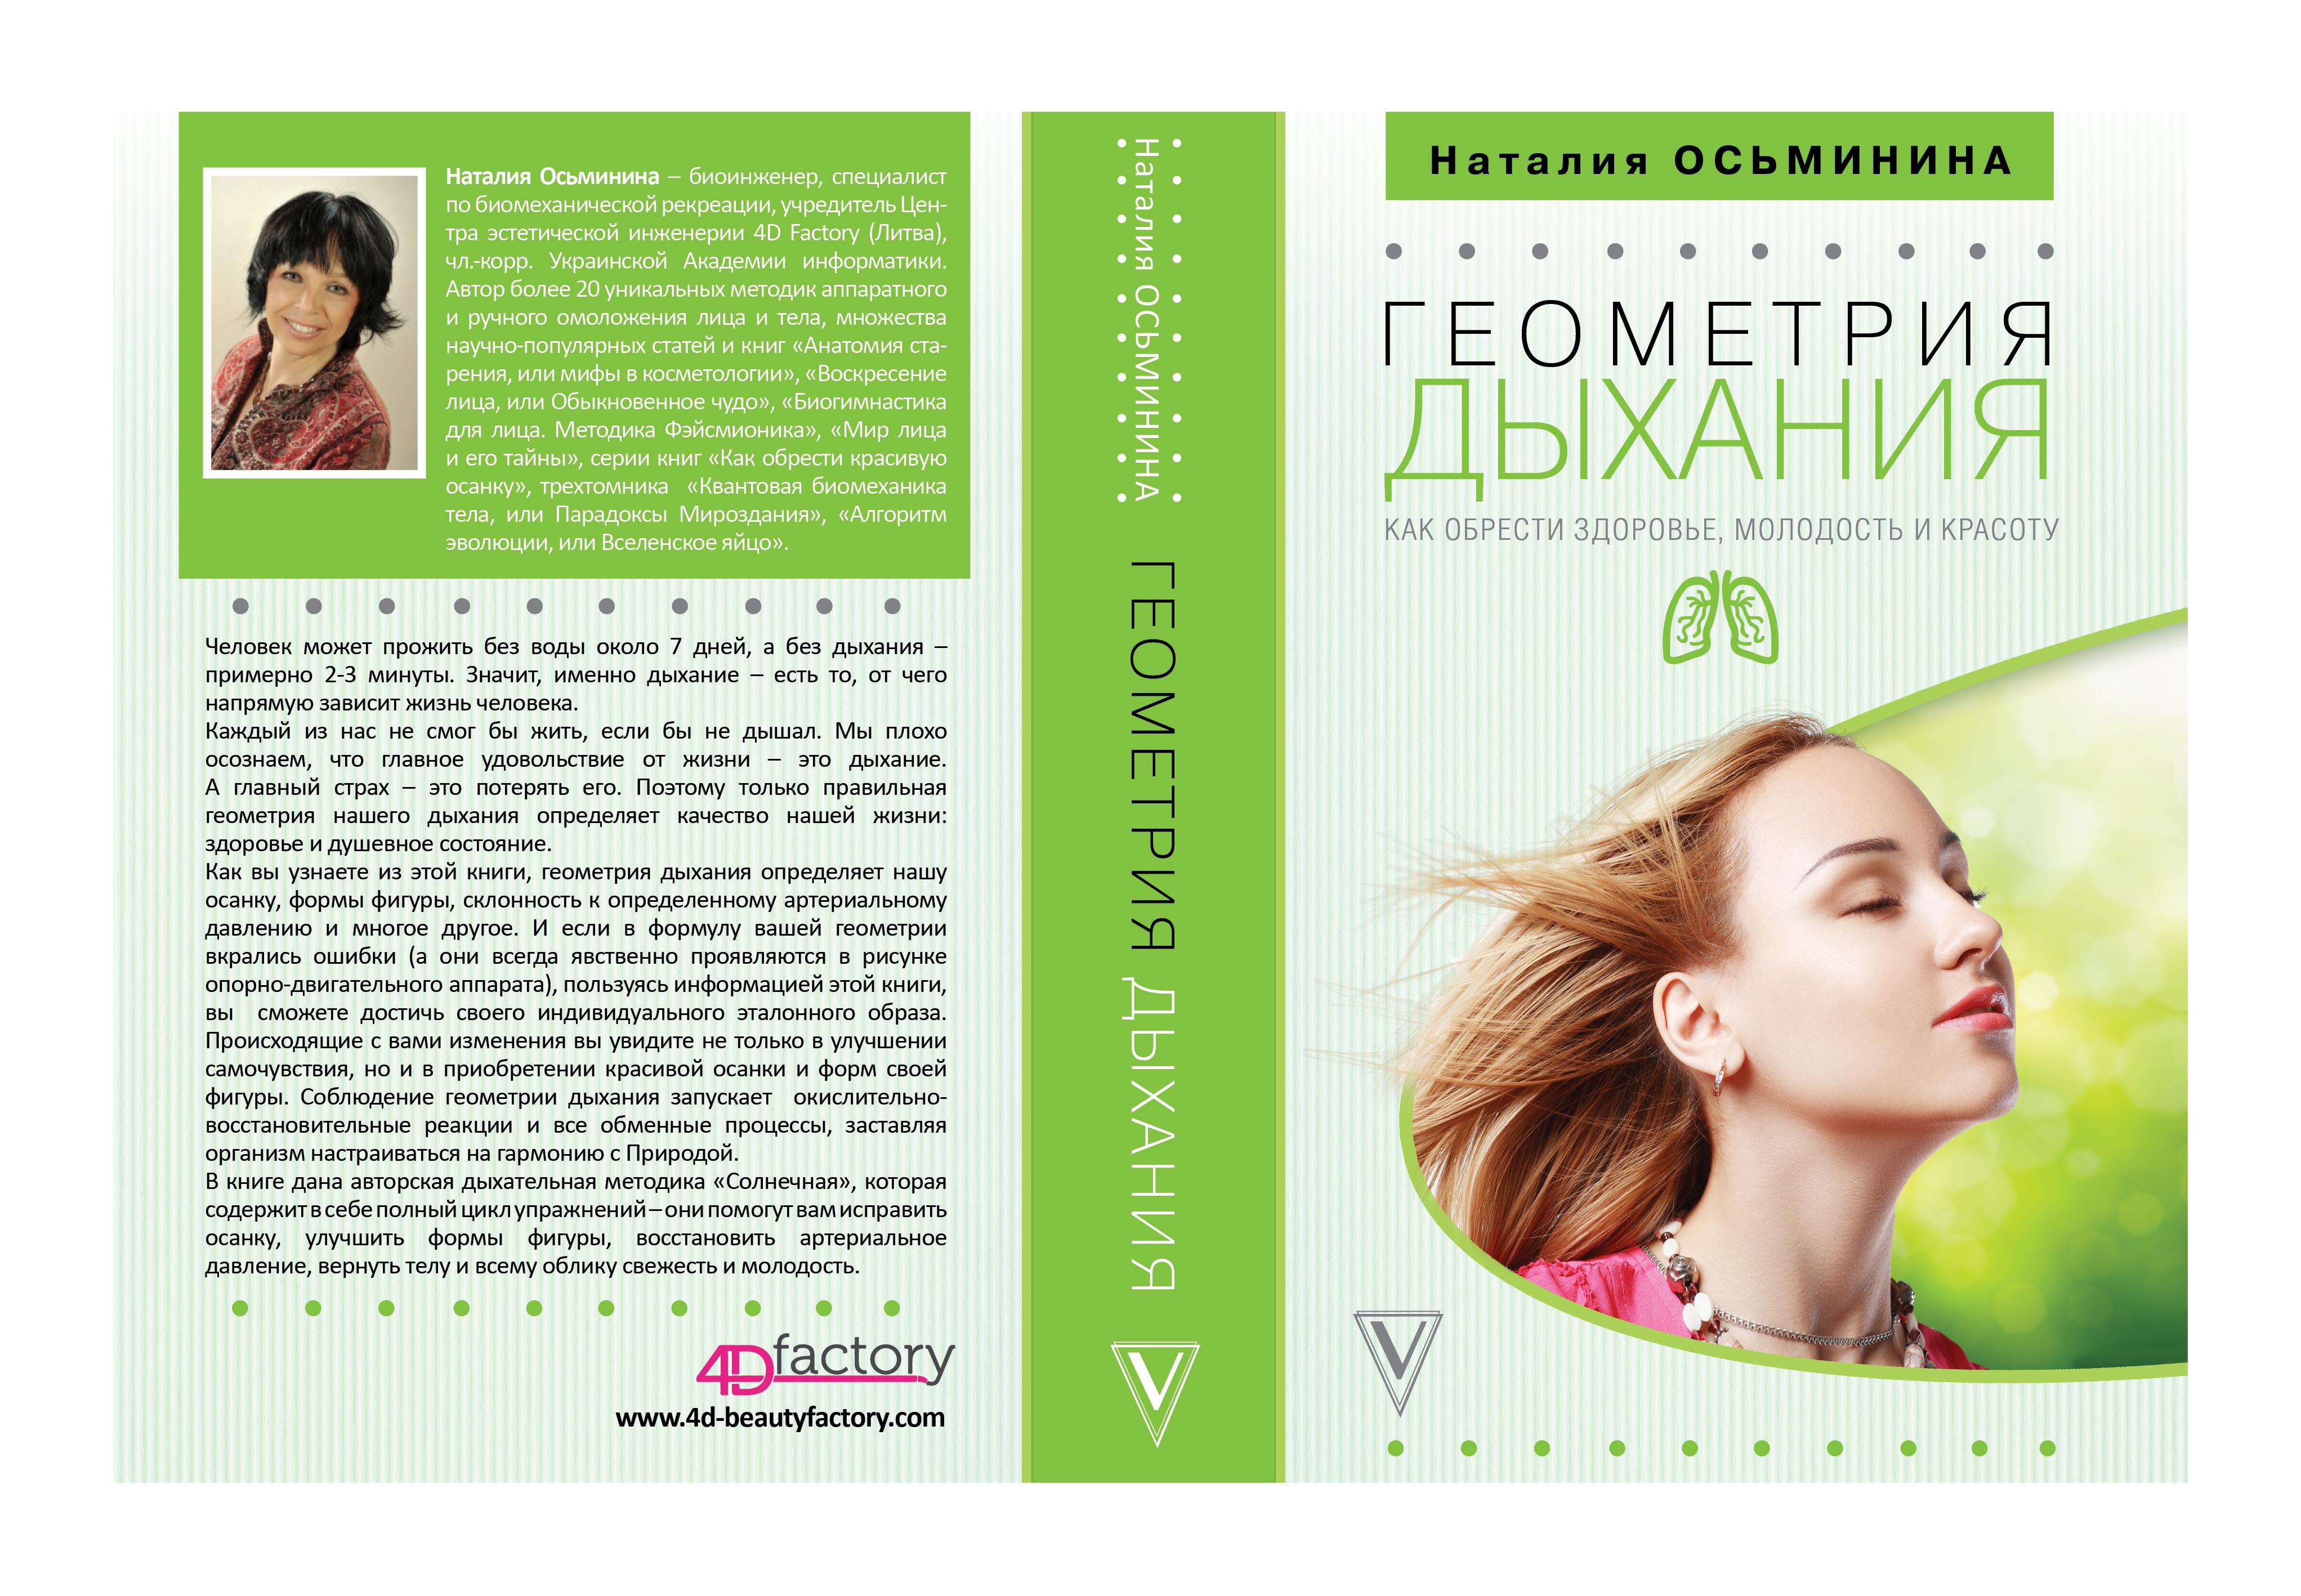 Blog user (Natalija Osminina (Osminina)) 29